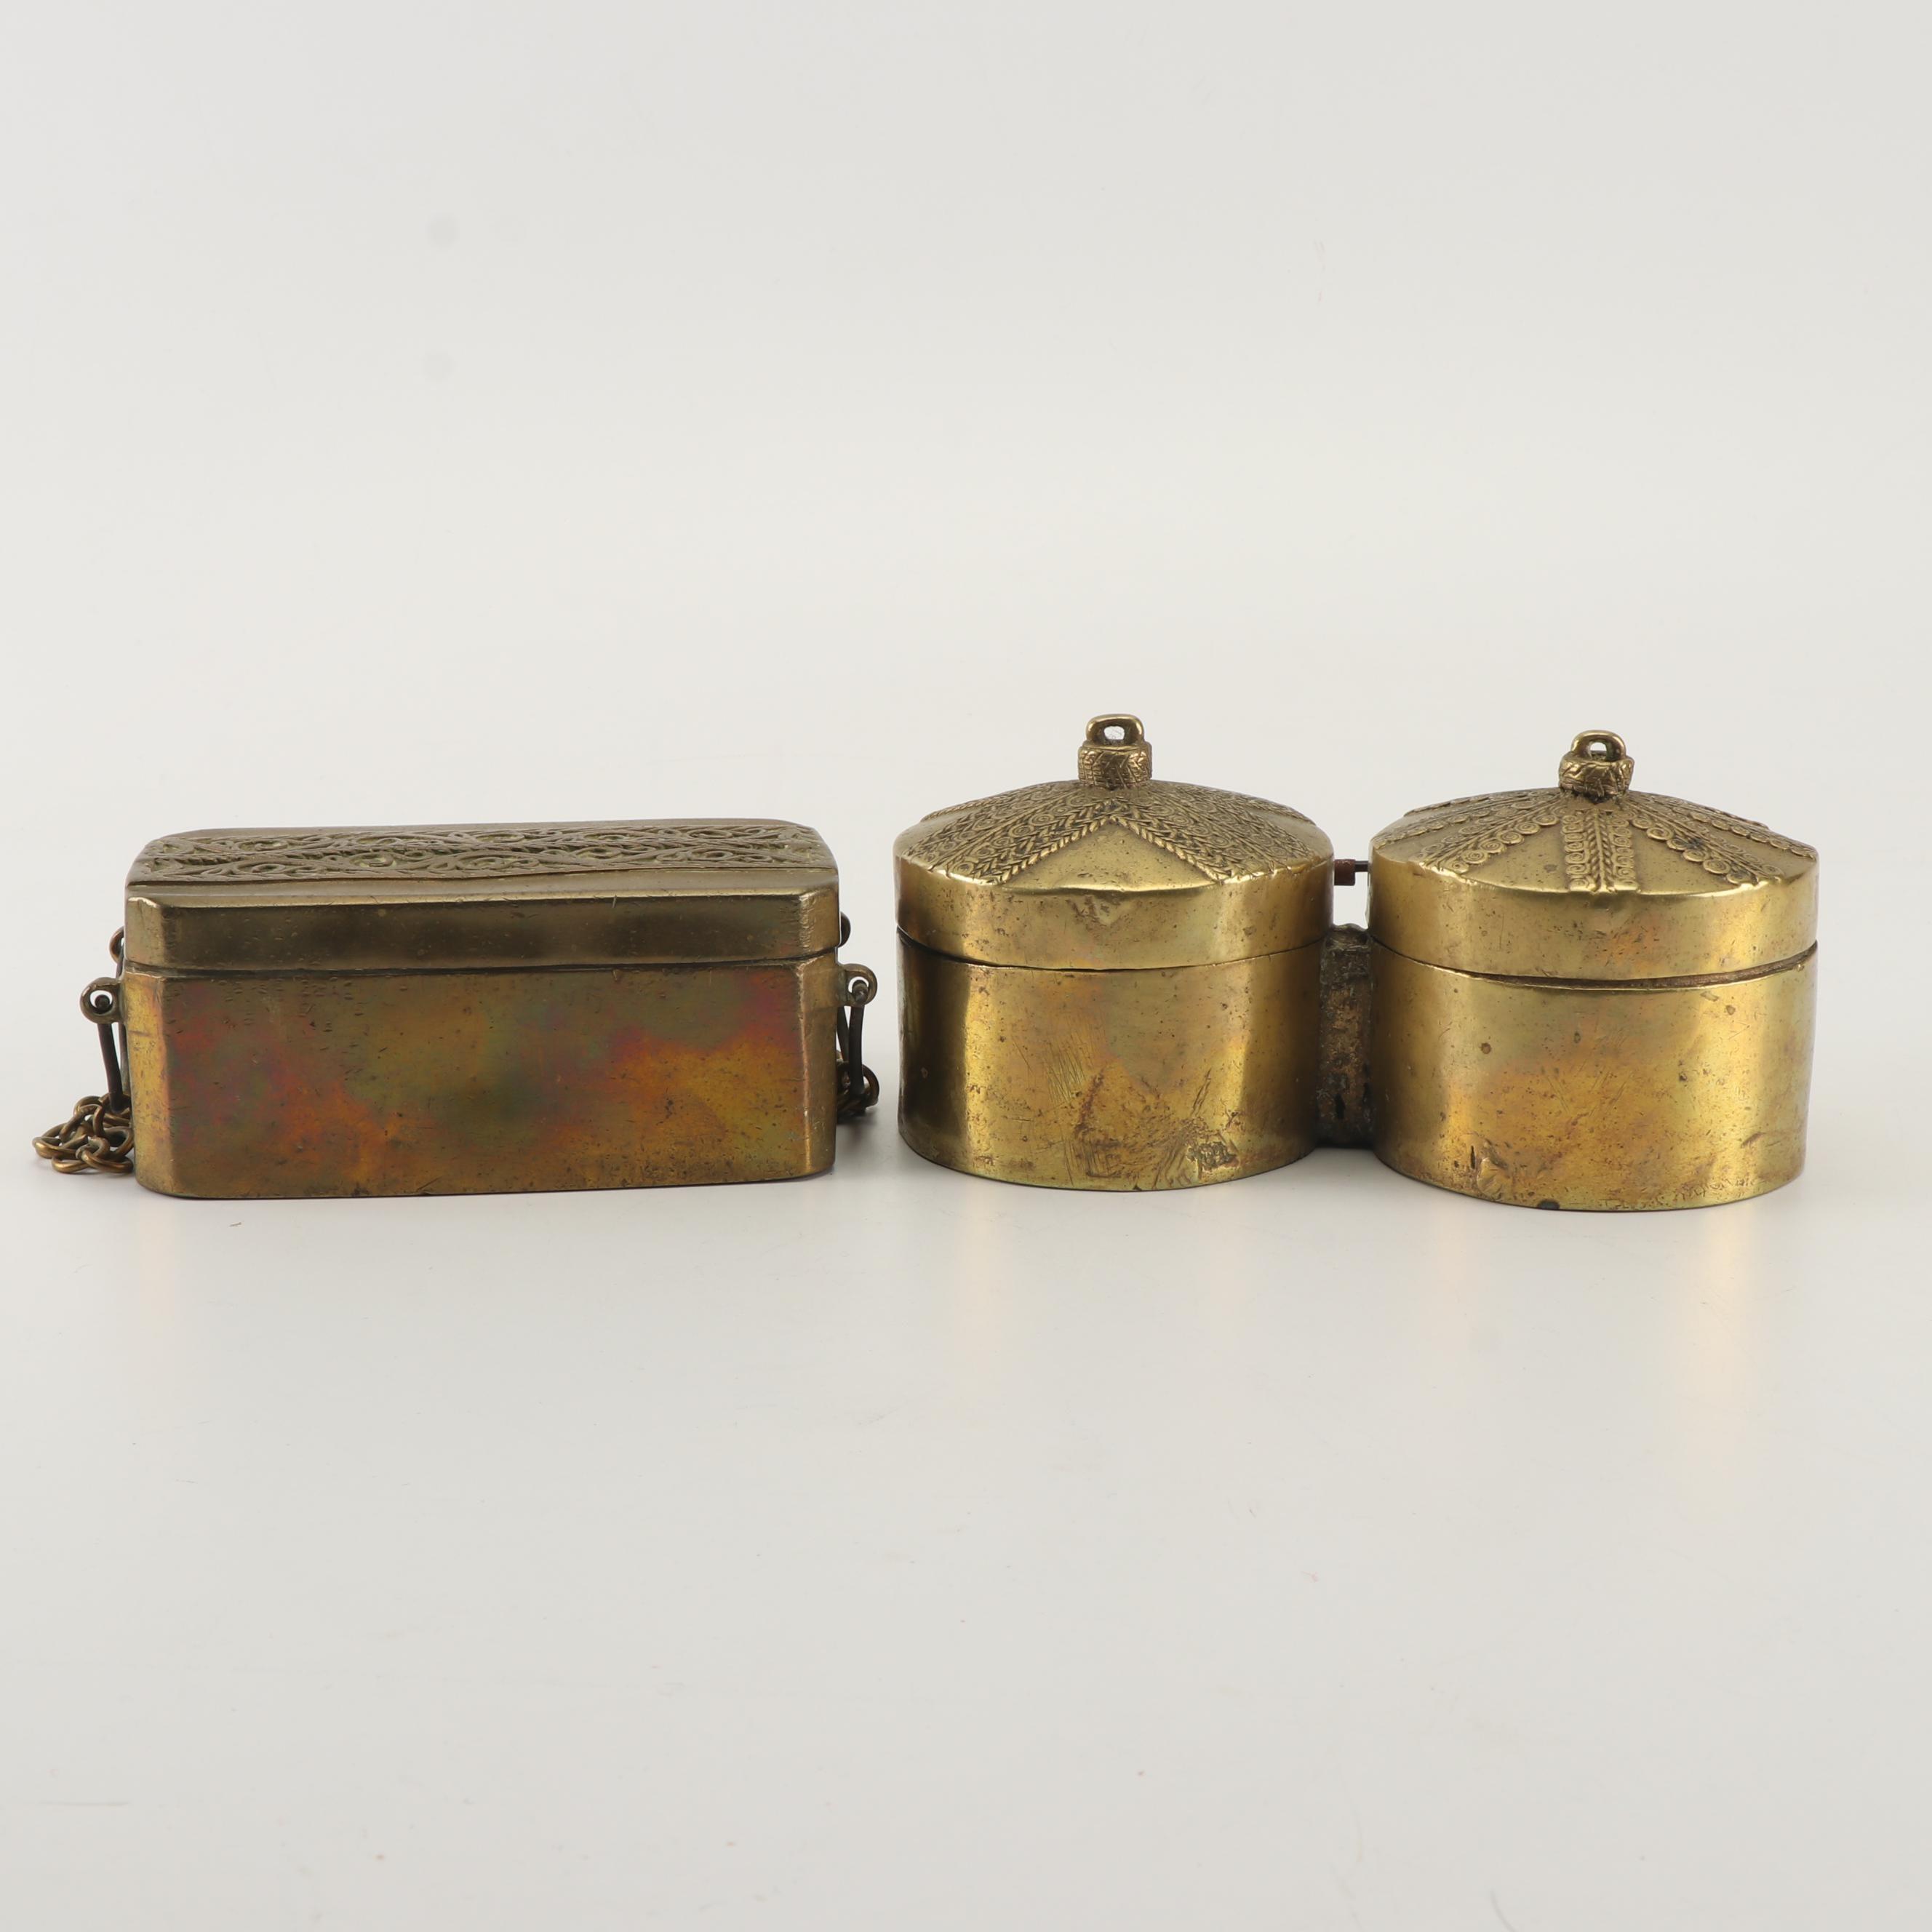 West Asian Brass Betel Nut Boxes